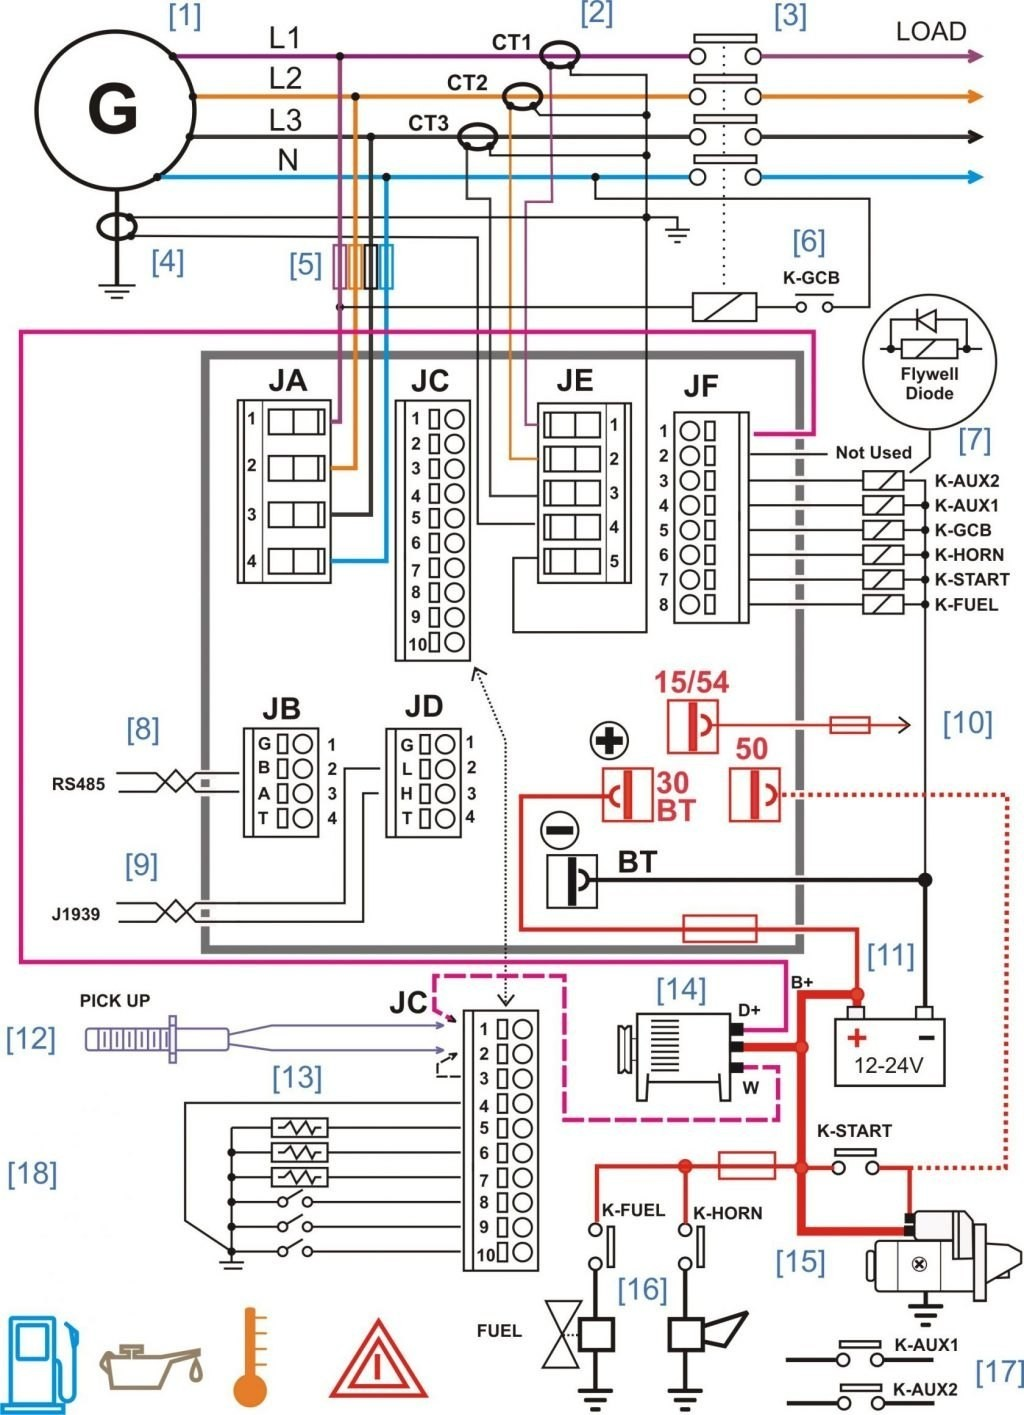 2012 Peterbilt 348 Wiring Schematic Library 388 Fuse Box 389 Radio Diagram Residential Electrical Symbols U2022